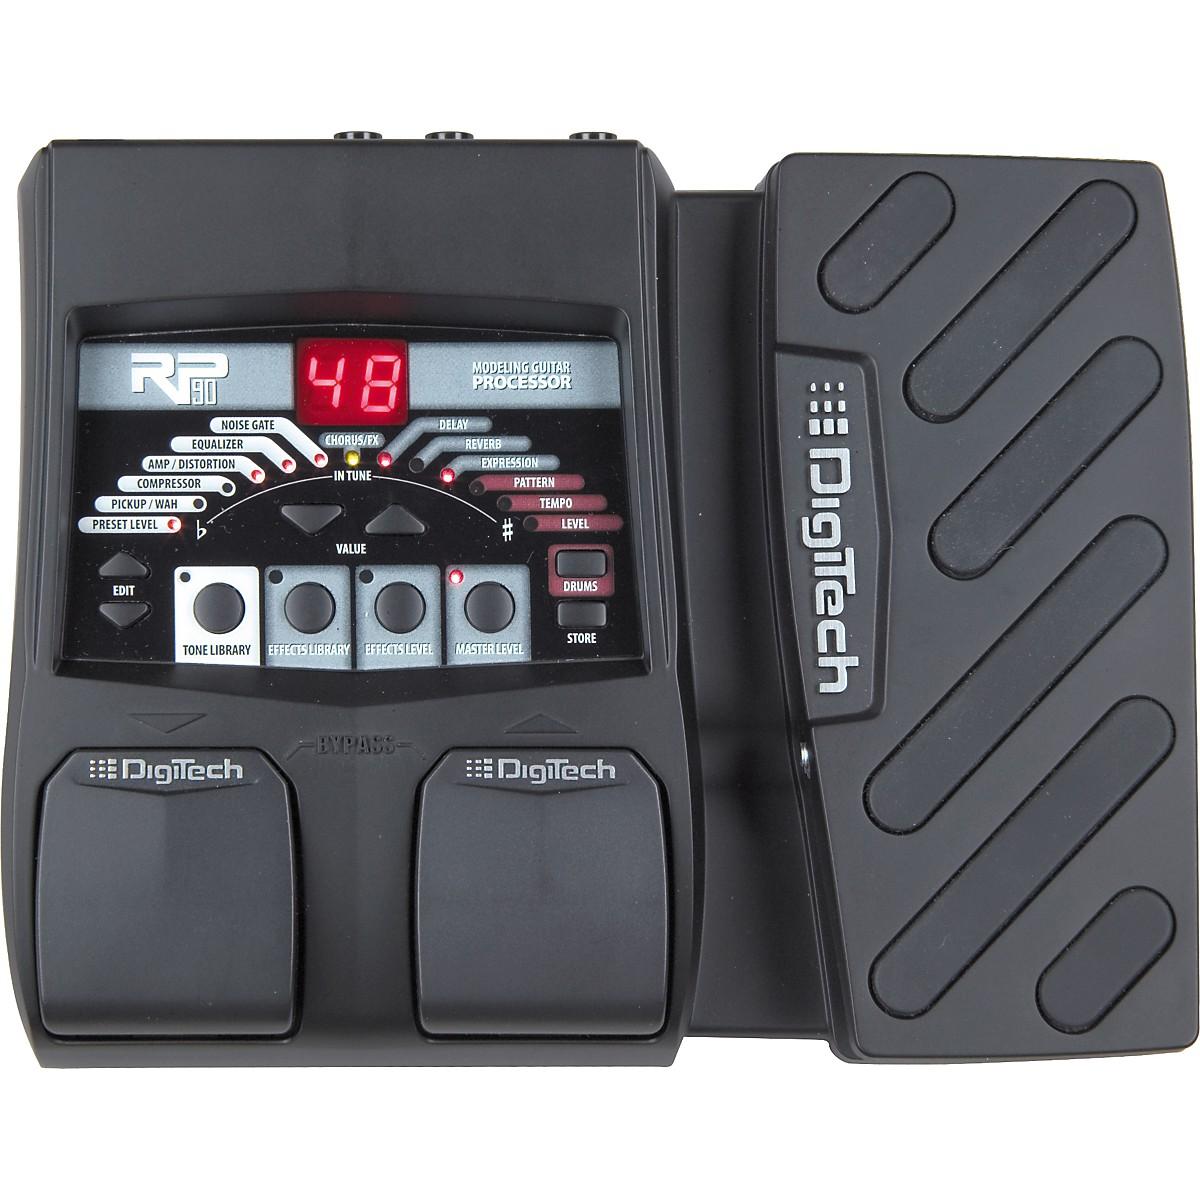 Digitech RP90 Guitar Multi Effects Pedal